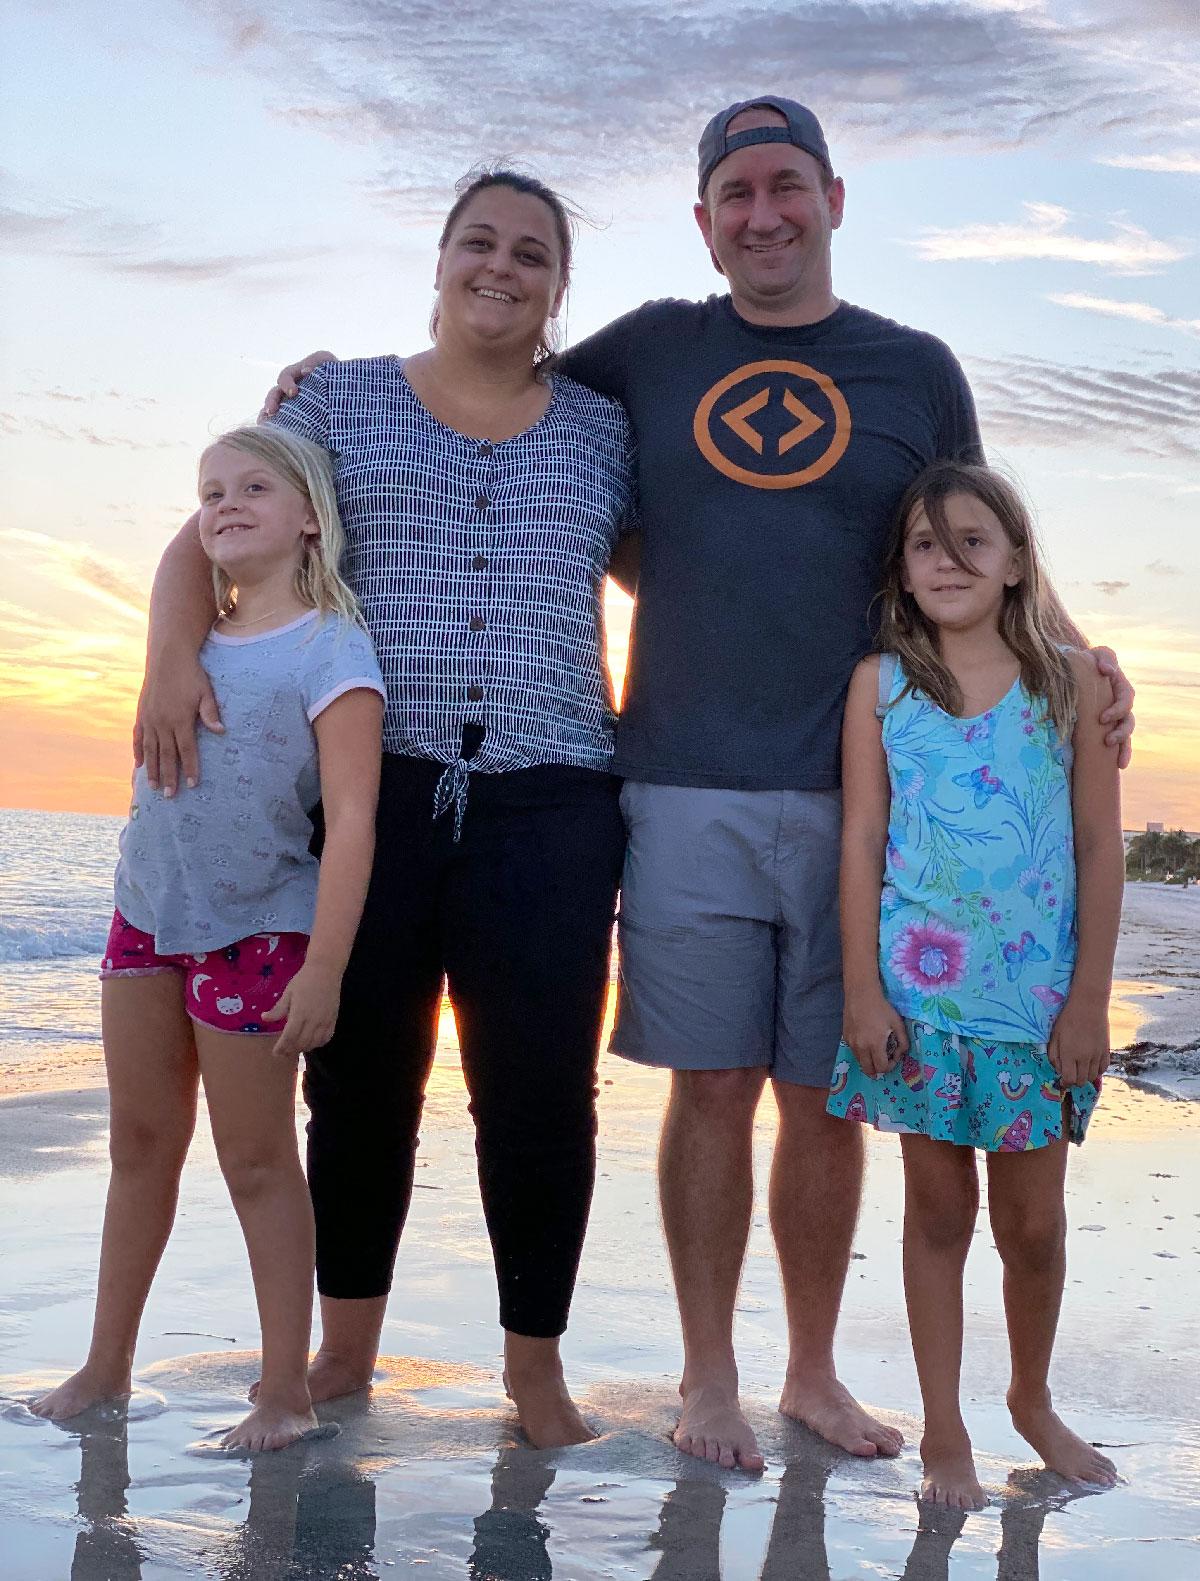 Family photo at the beach.